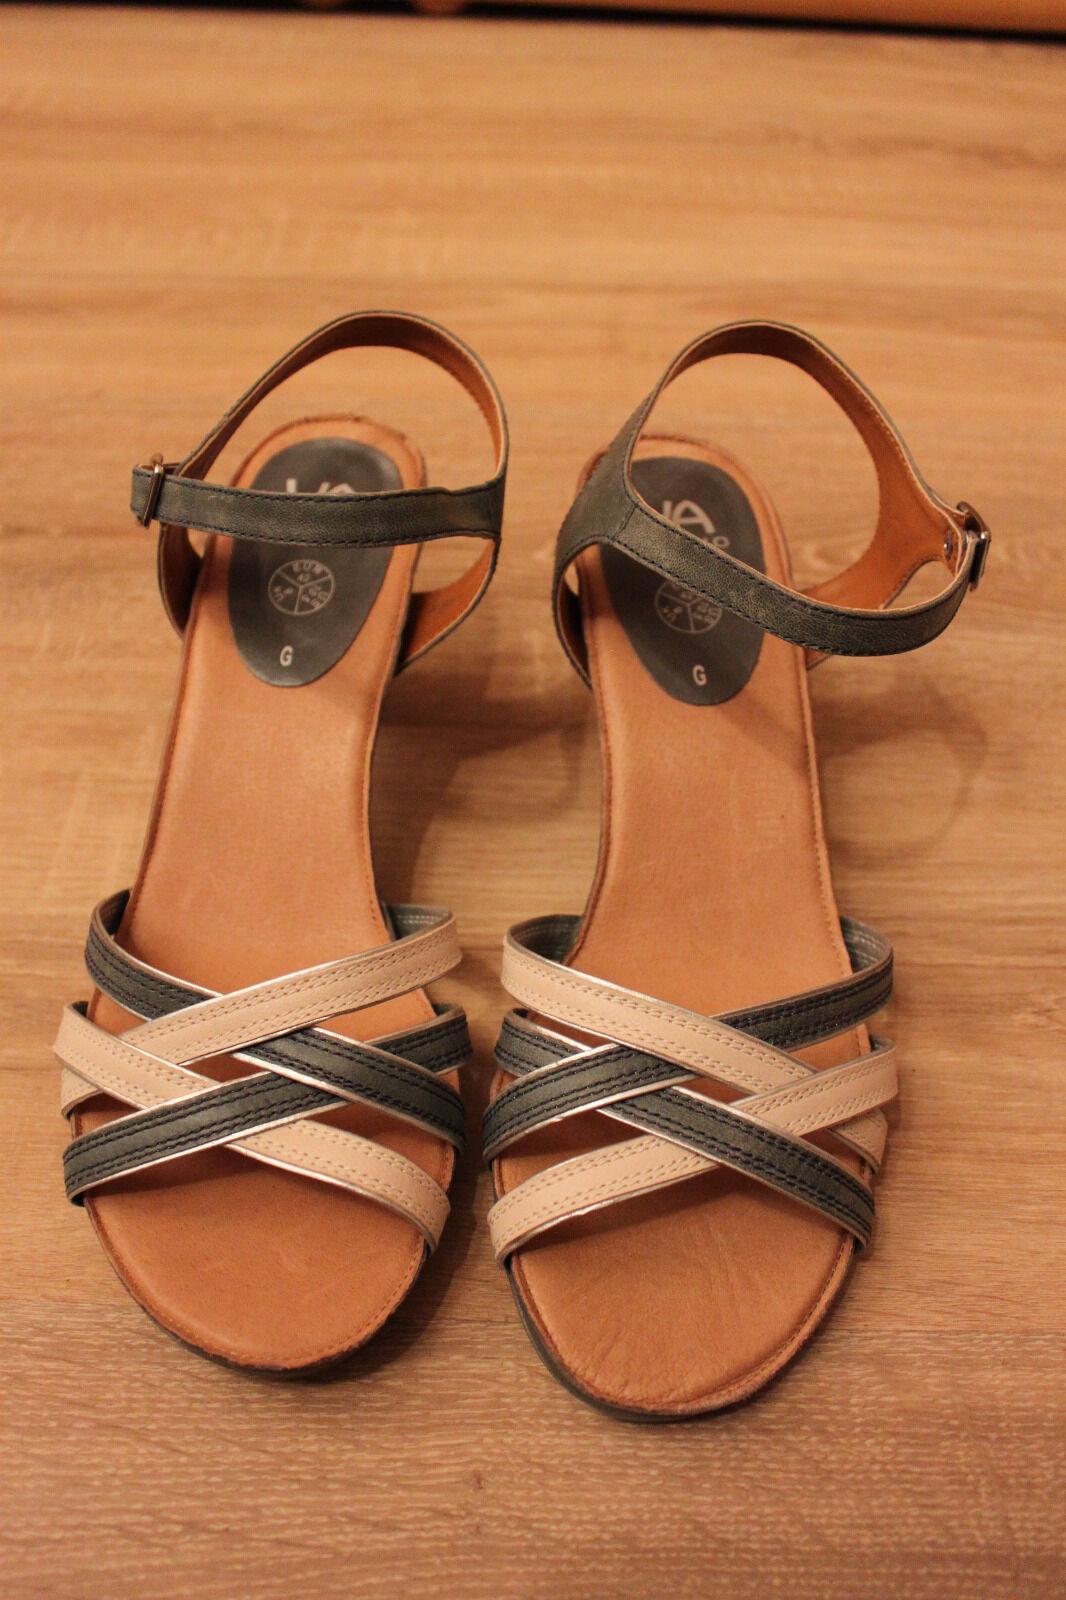 VIA MILANO Riemchen-Sandaleette, echt Leder, Zierschnalle, Absatz ca. 6 cm, Gr 8